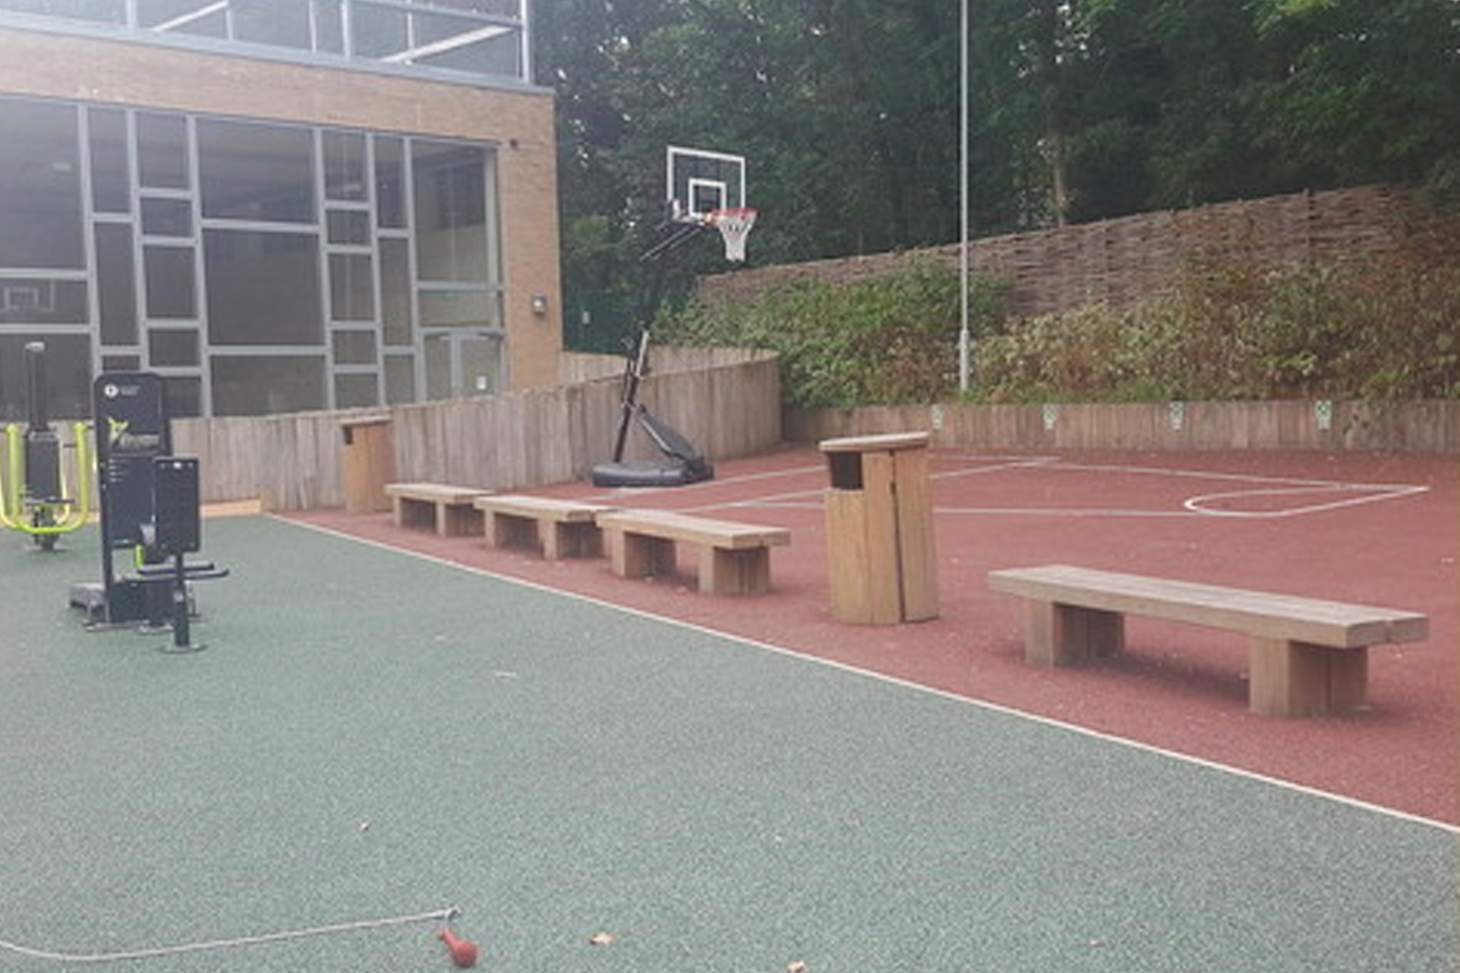 Priory School Croydon Playground space hire